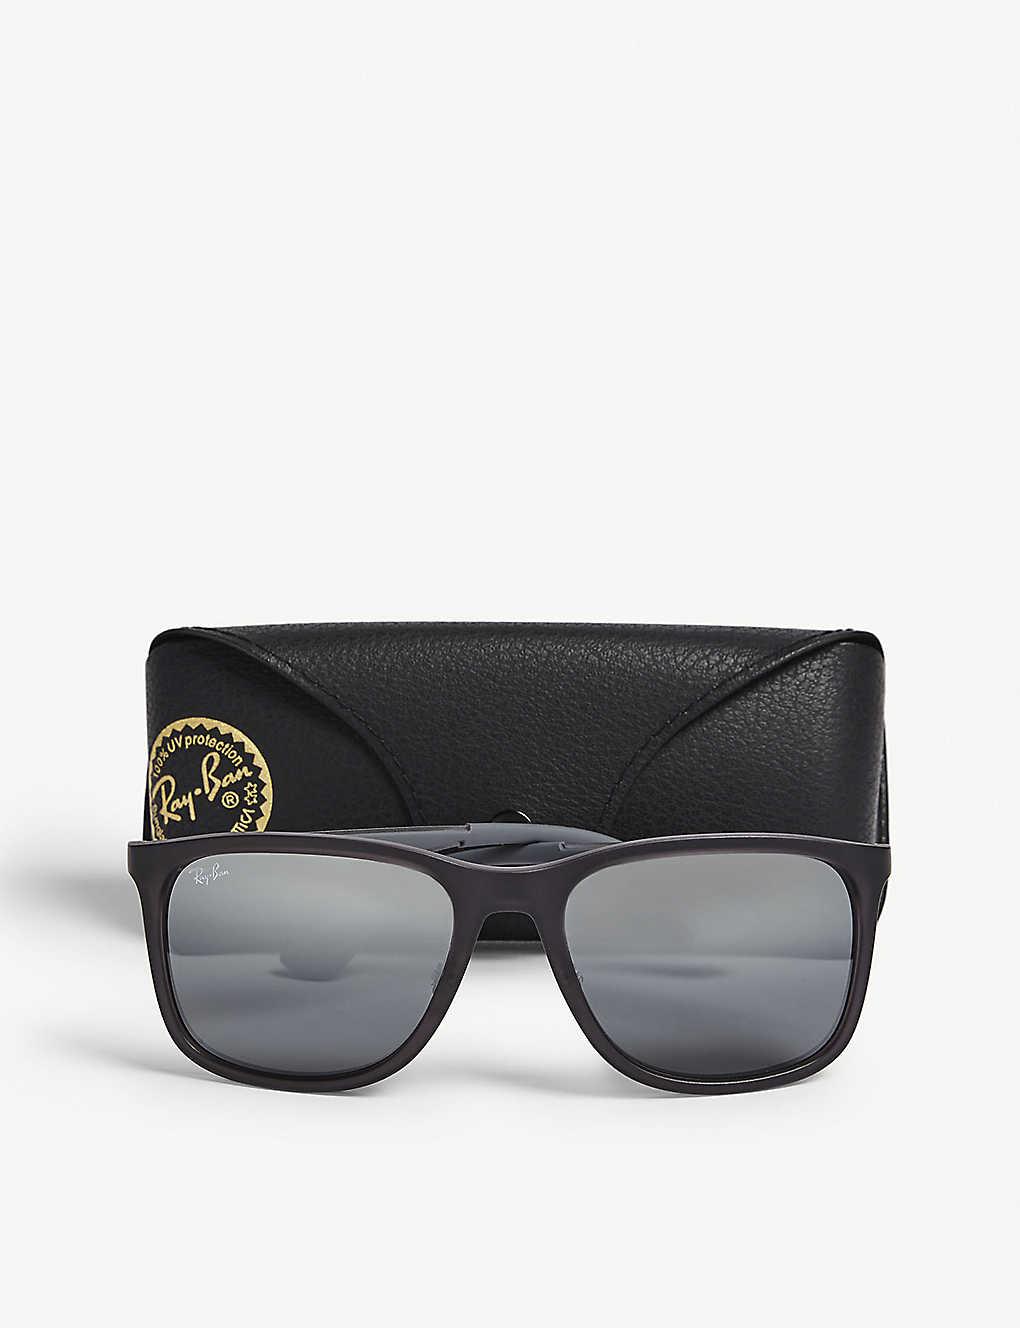 74d178baebc81 ... RB4313 square-frame sunglasses - Grey ...